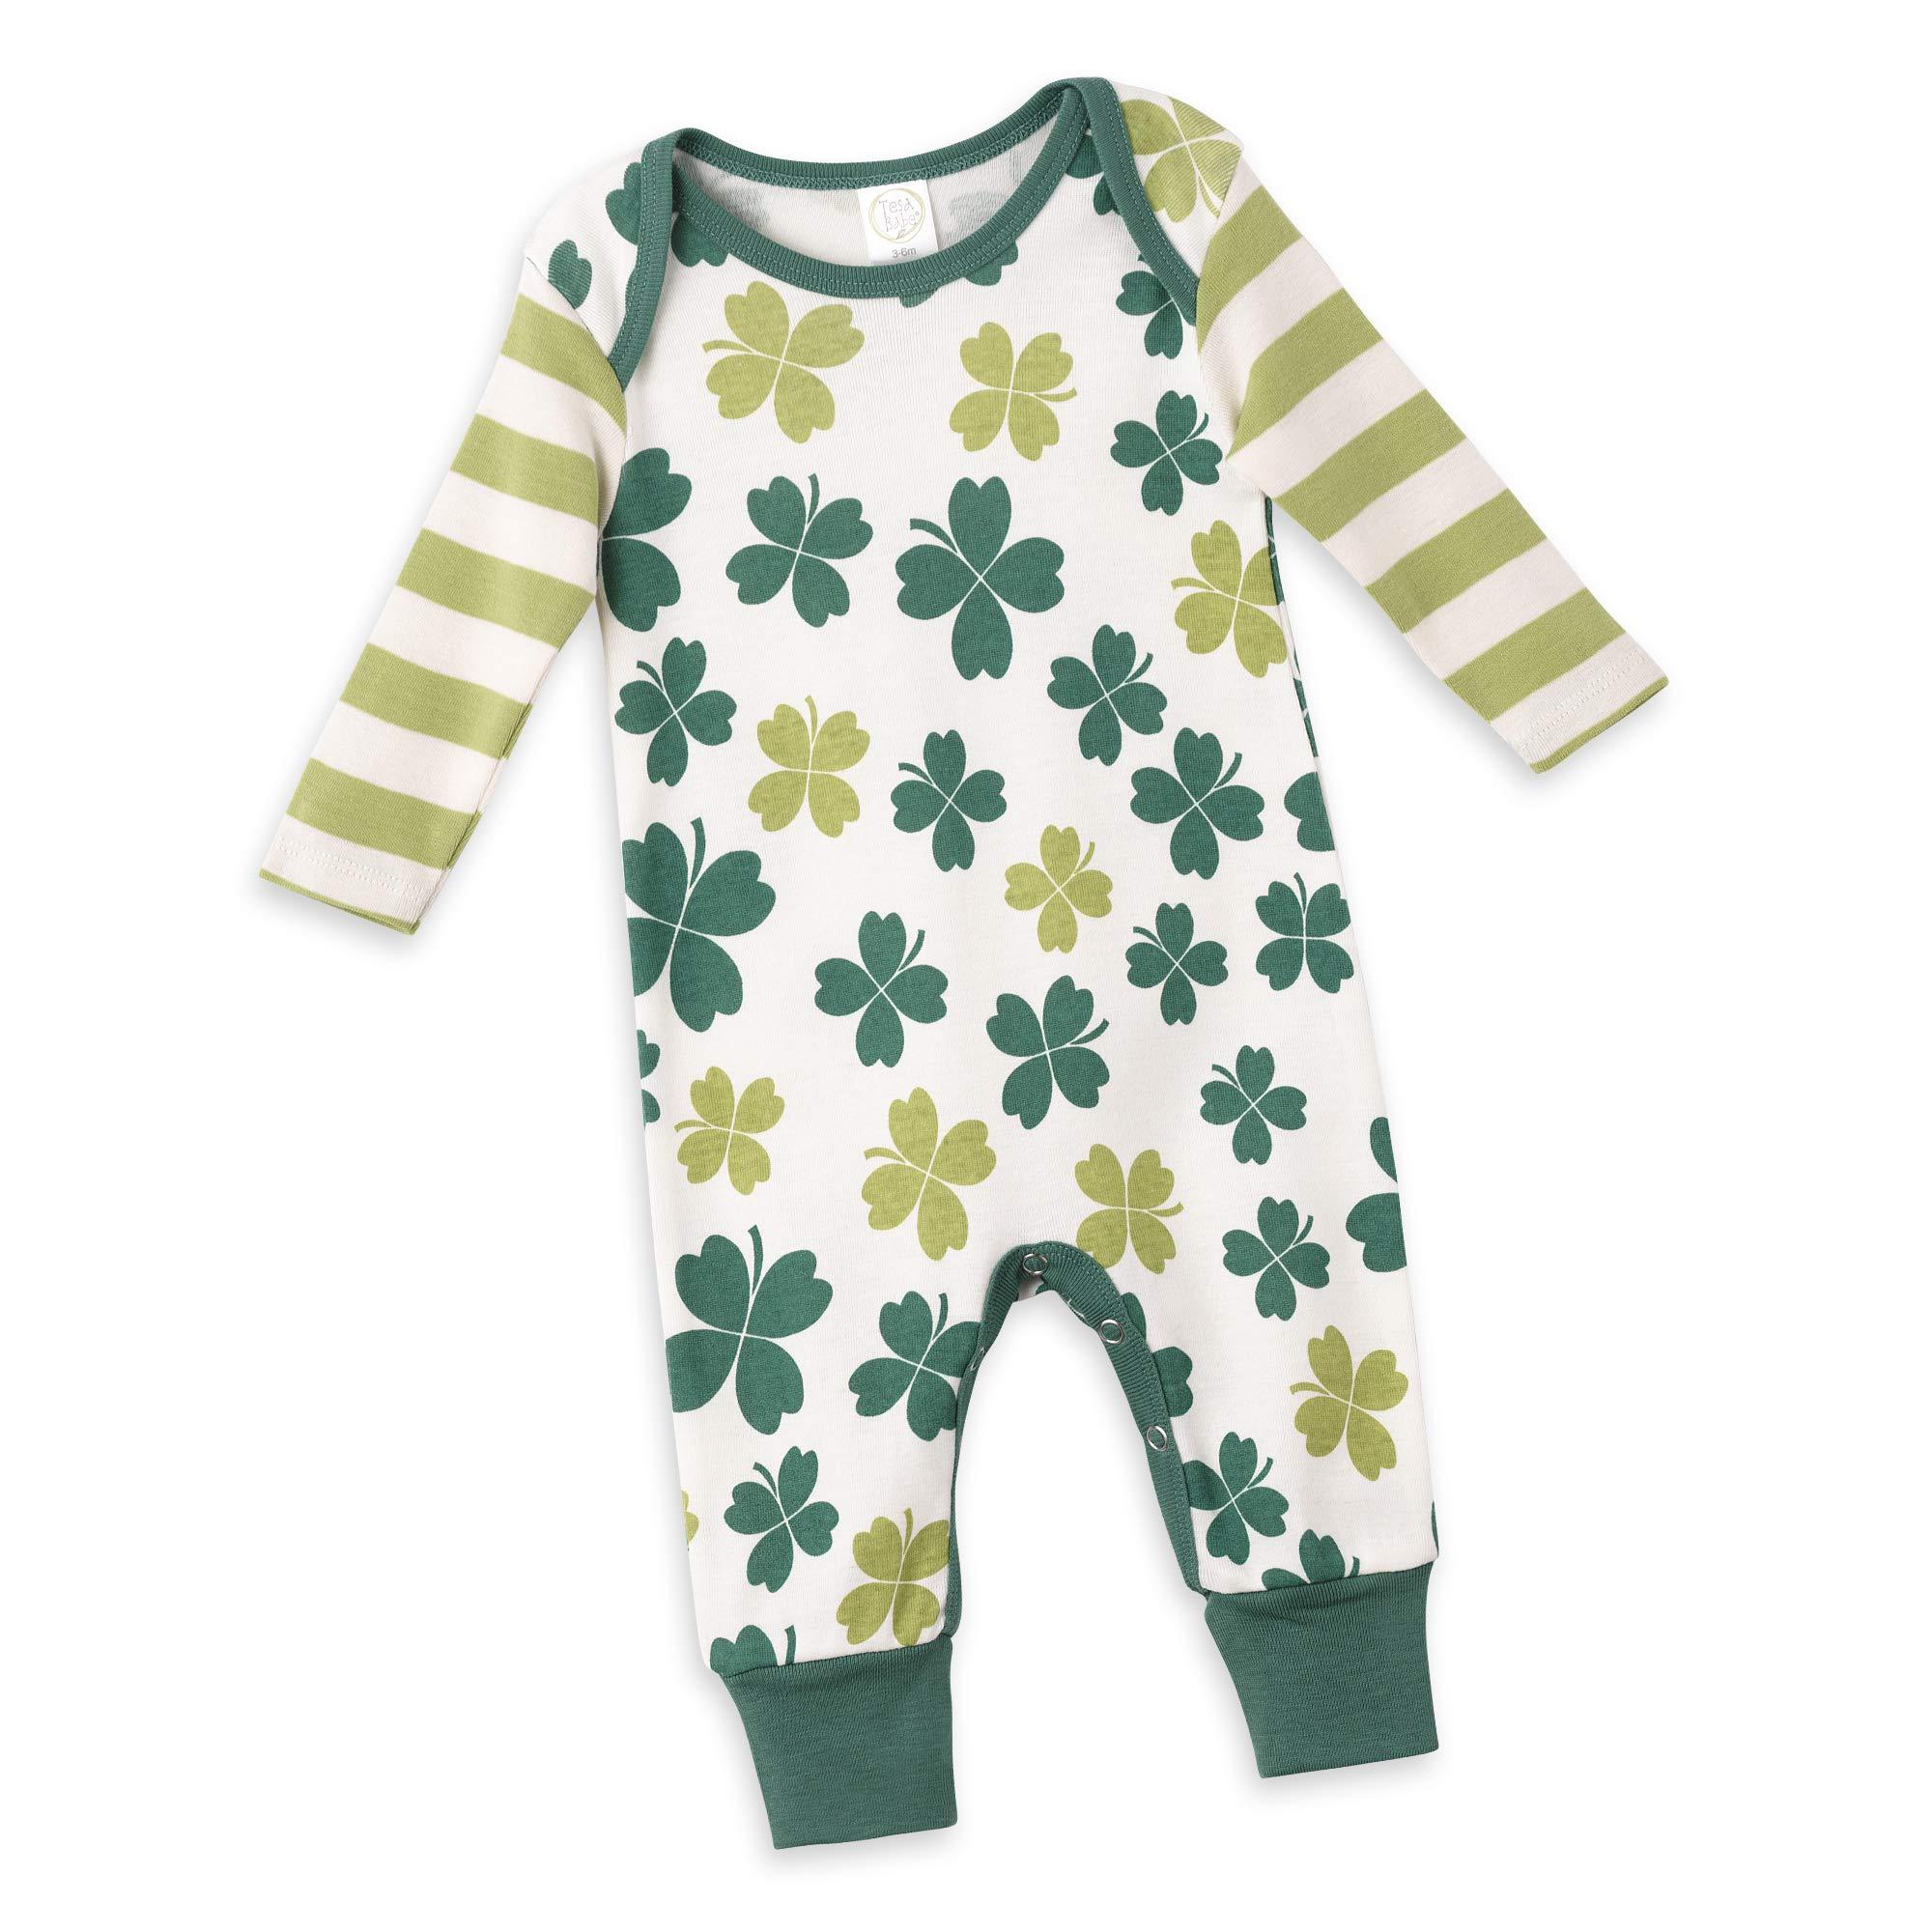 Tesa Babe Irish Baby Romper with Shamrocks for St Patrick's Day Newborn Baby to Toddlers, Multi